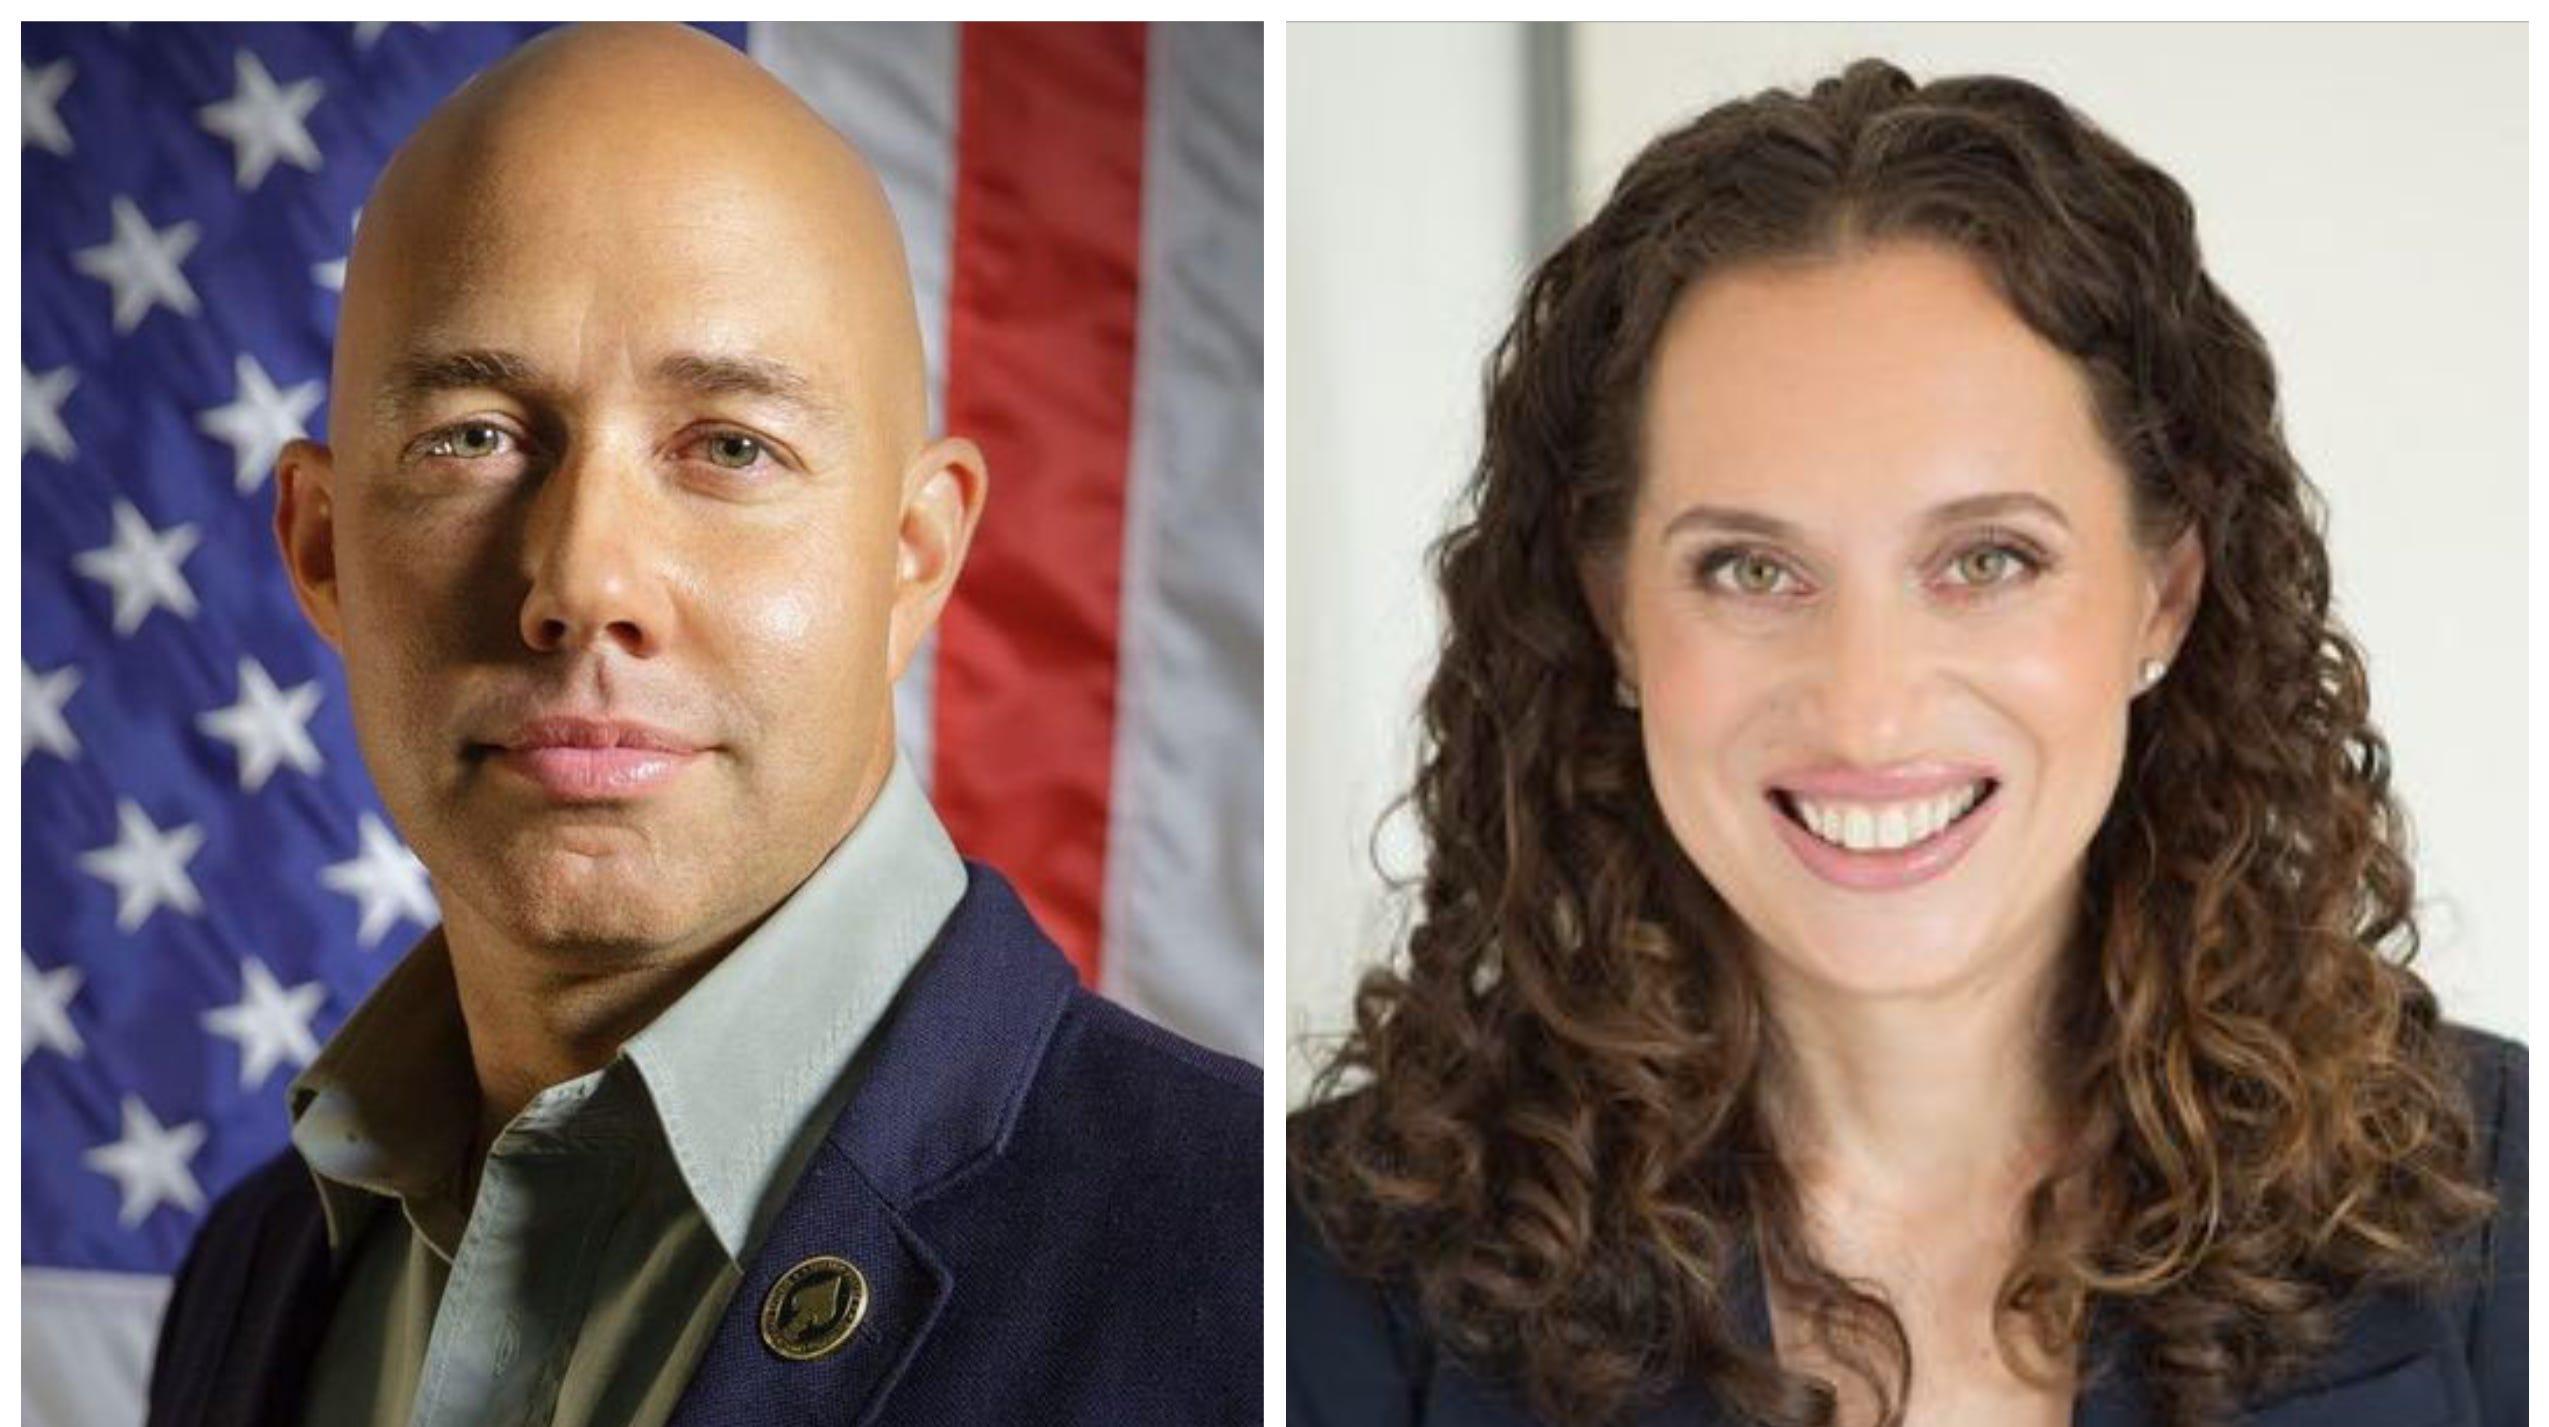 Brian Mast, Lauren Baer disagree on algae, environmental solutions in District 18 race